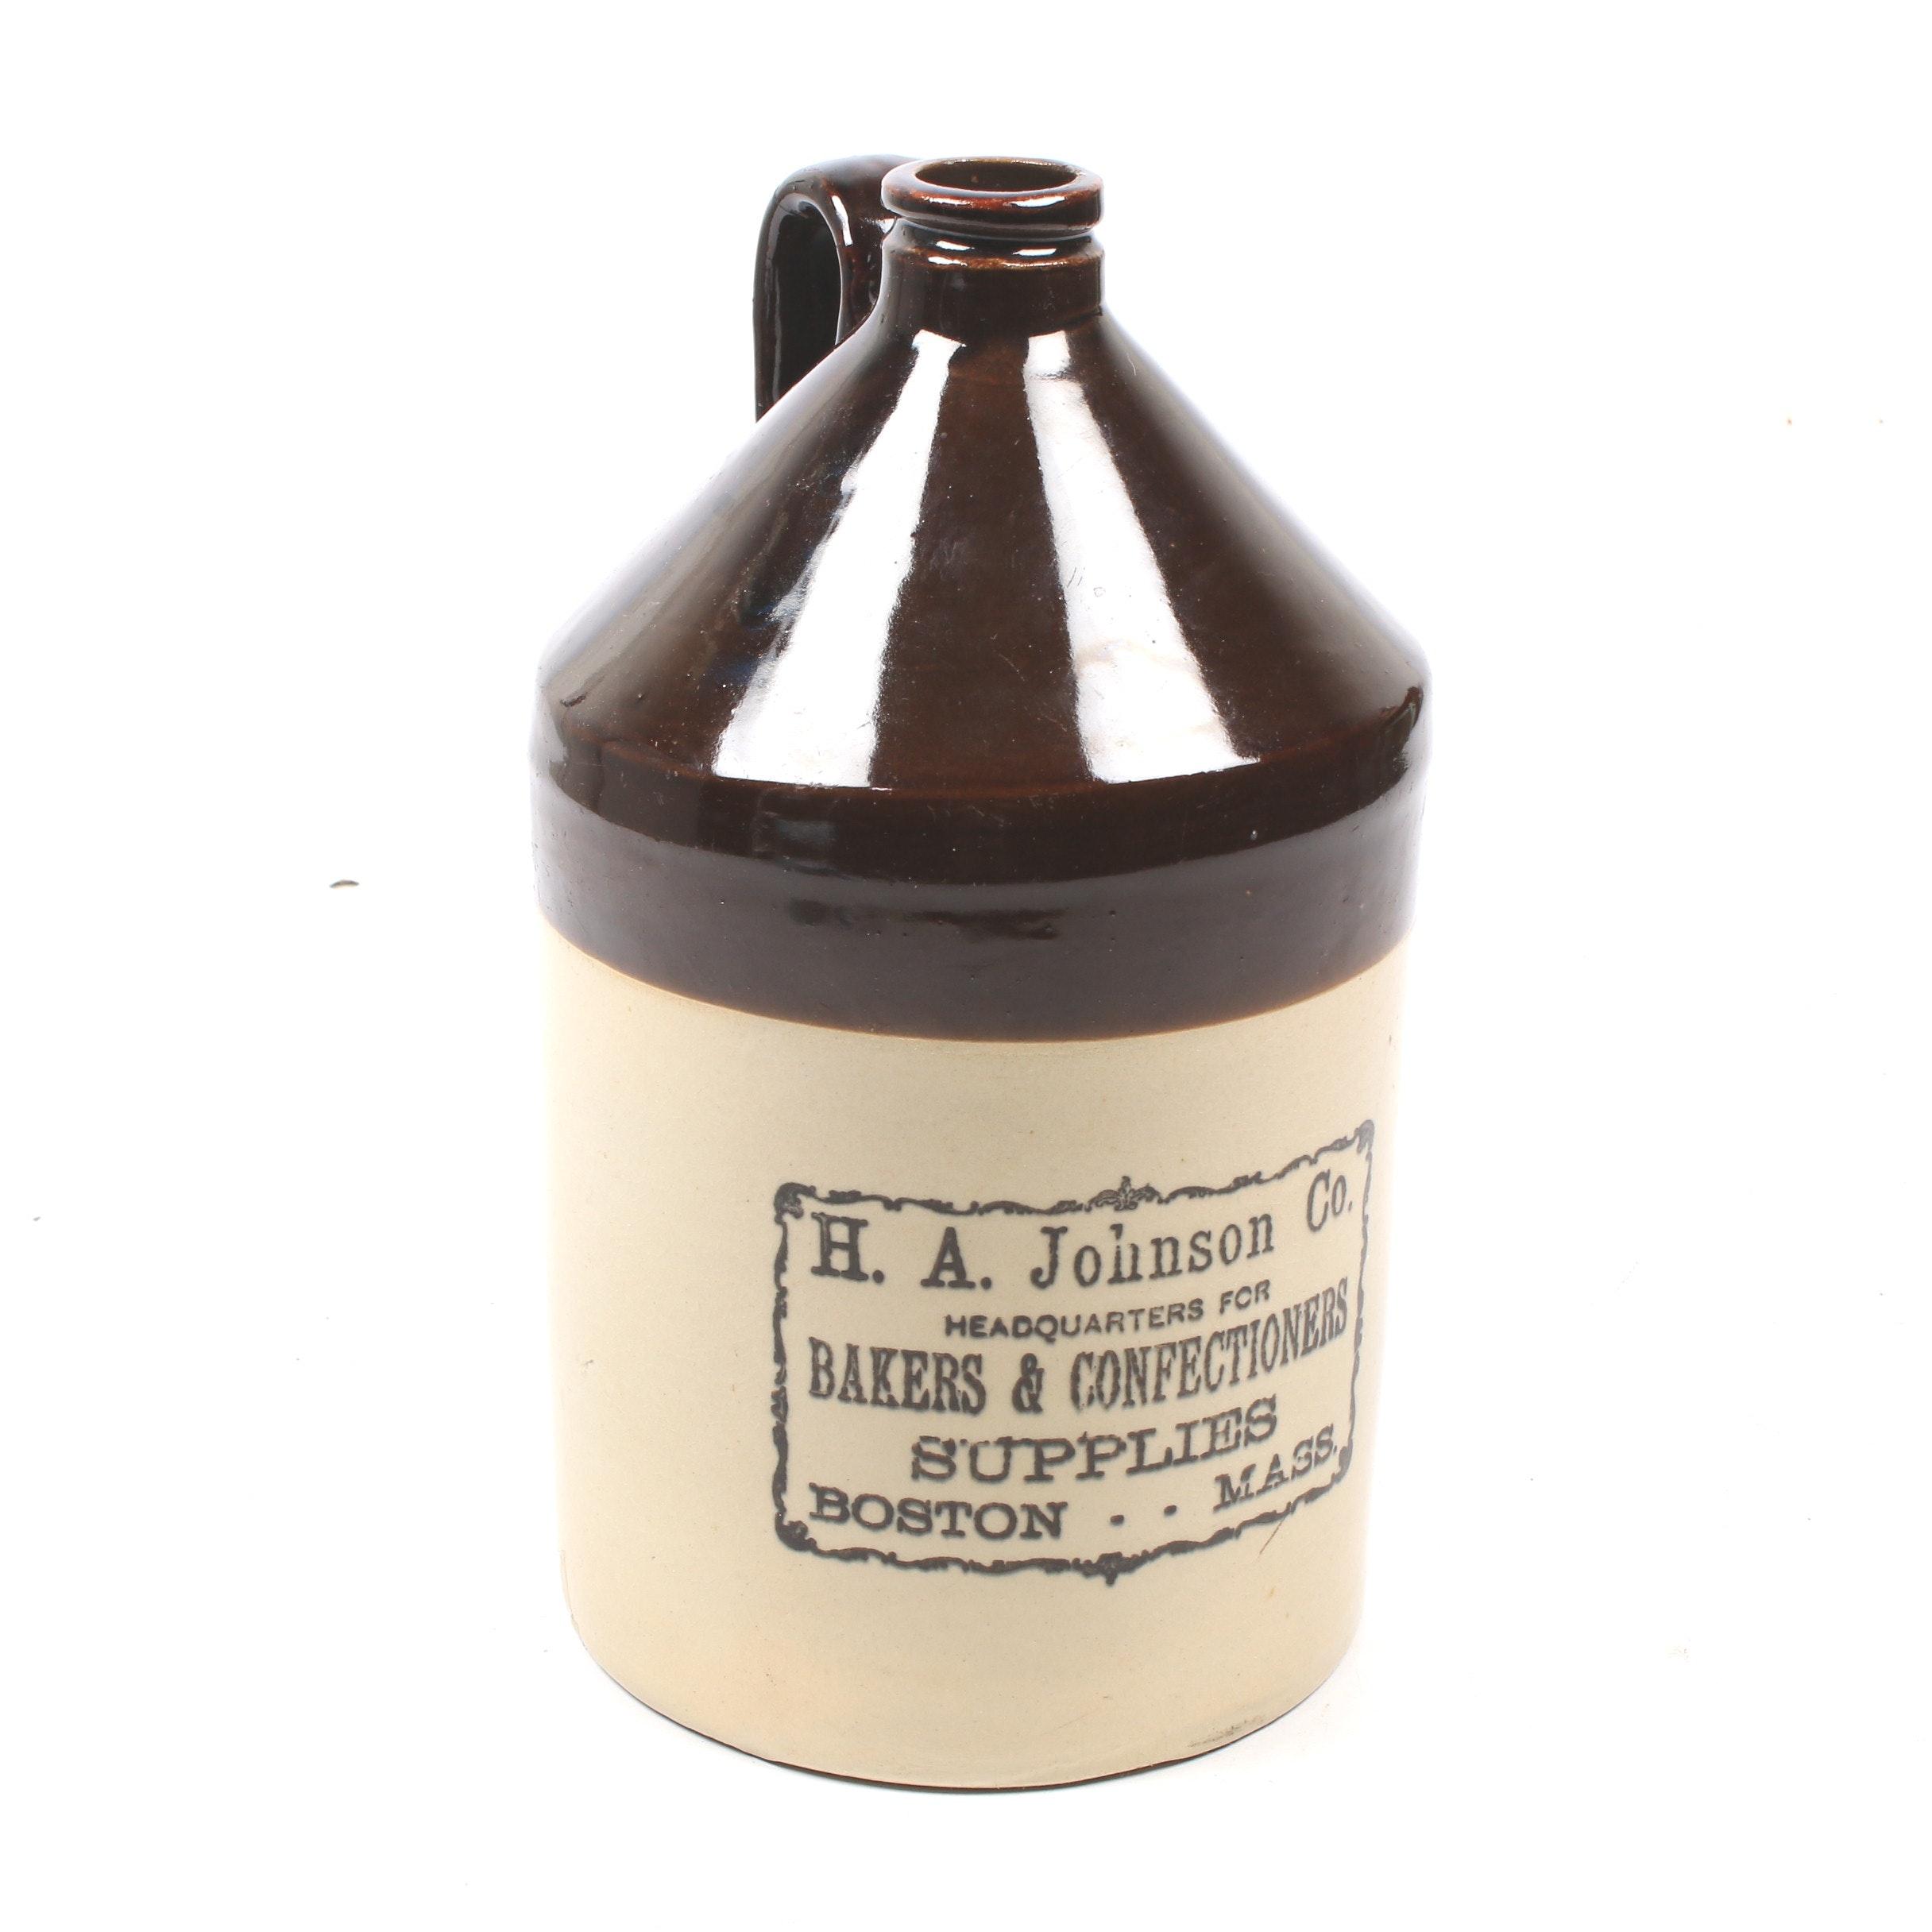 H. A. Johnson Co. Salt Glazed Stoneware Jug, Early 20th Century